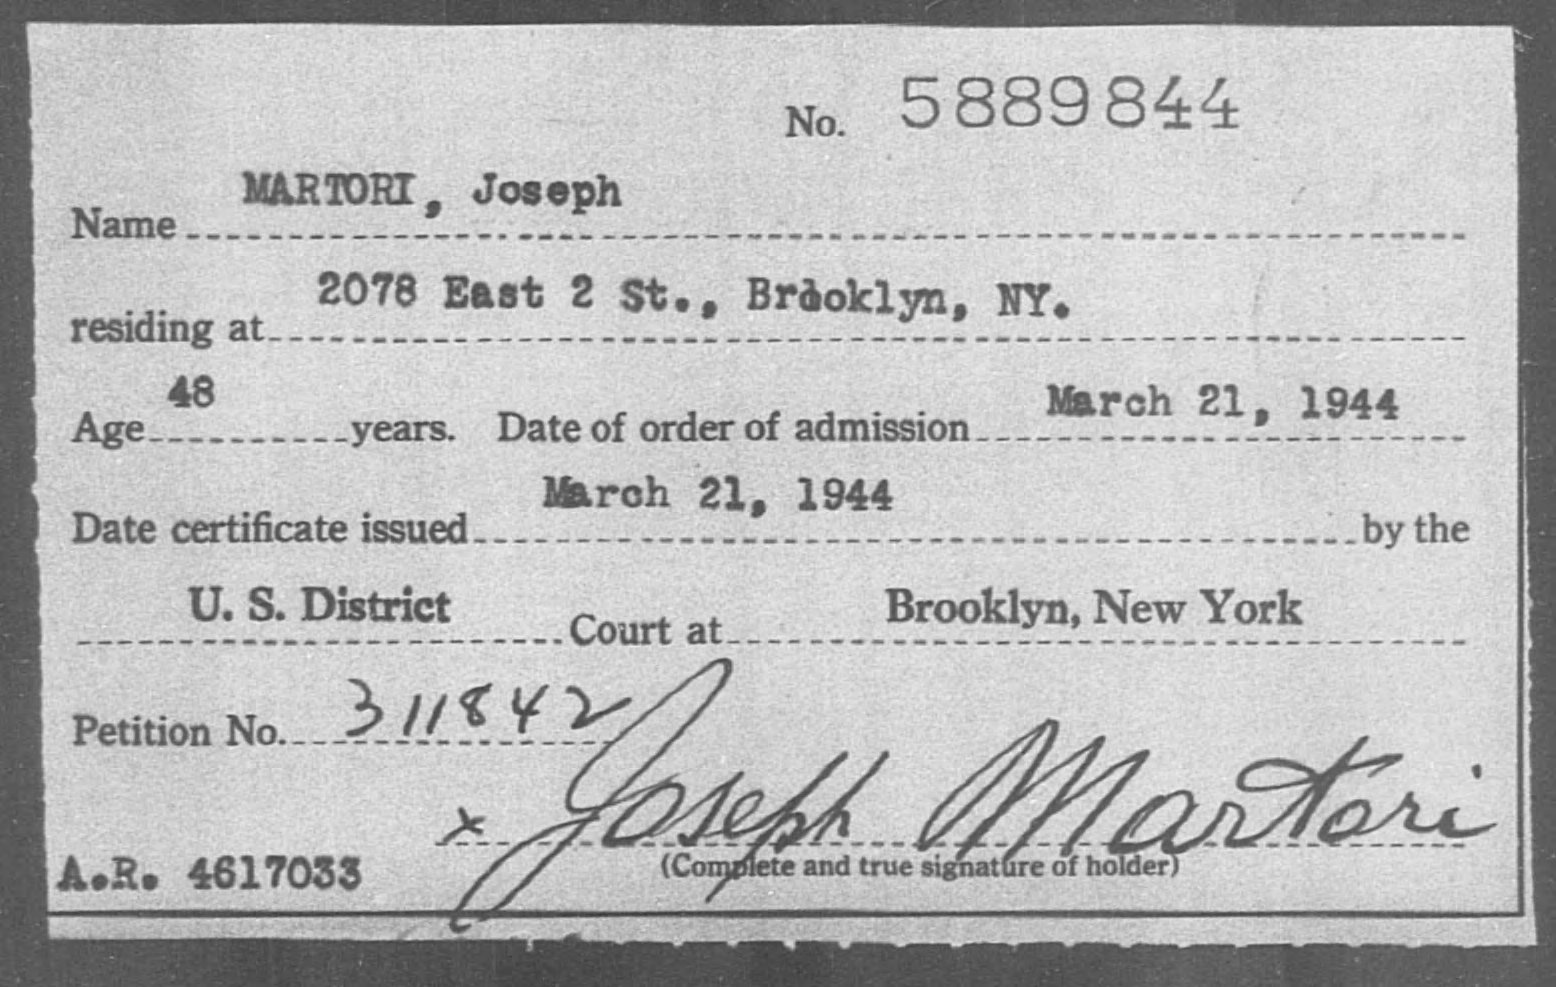 MARTORI, Joseph - Born: [BLANK], Naturalized: 1944